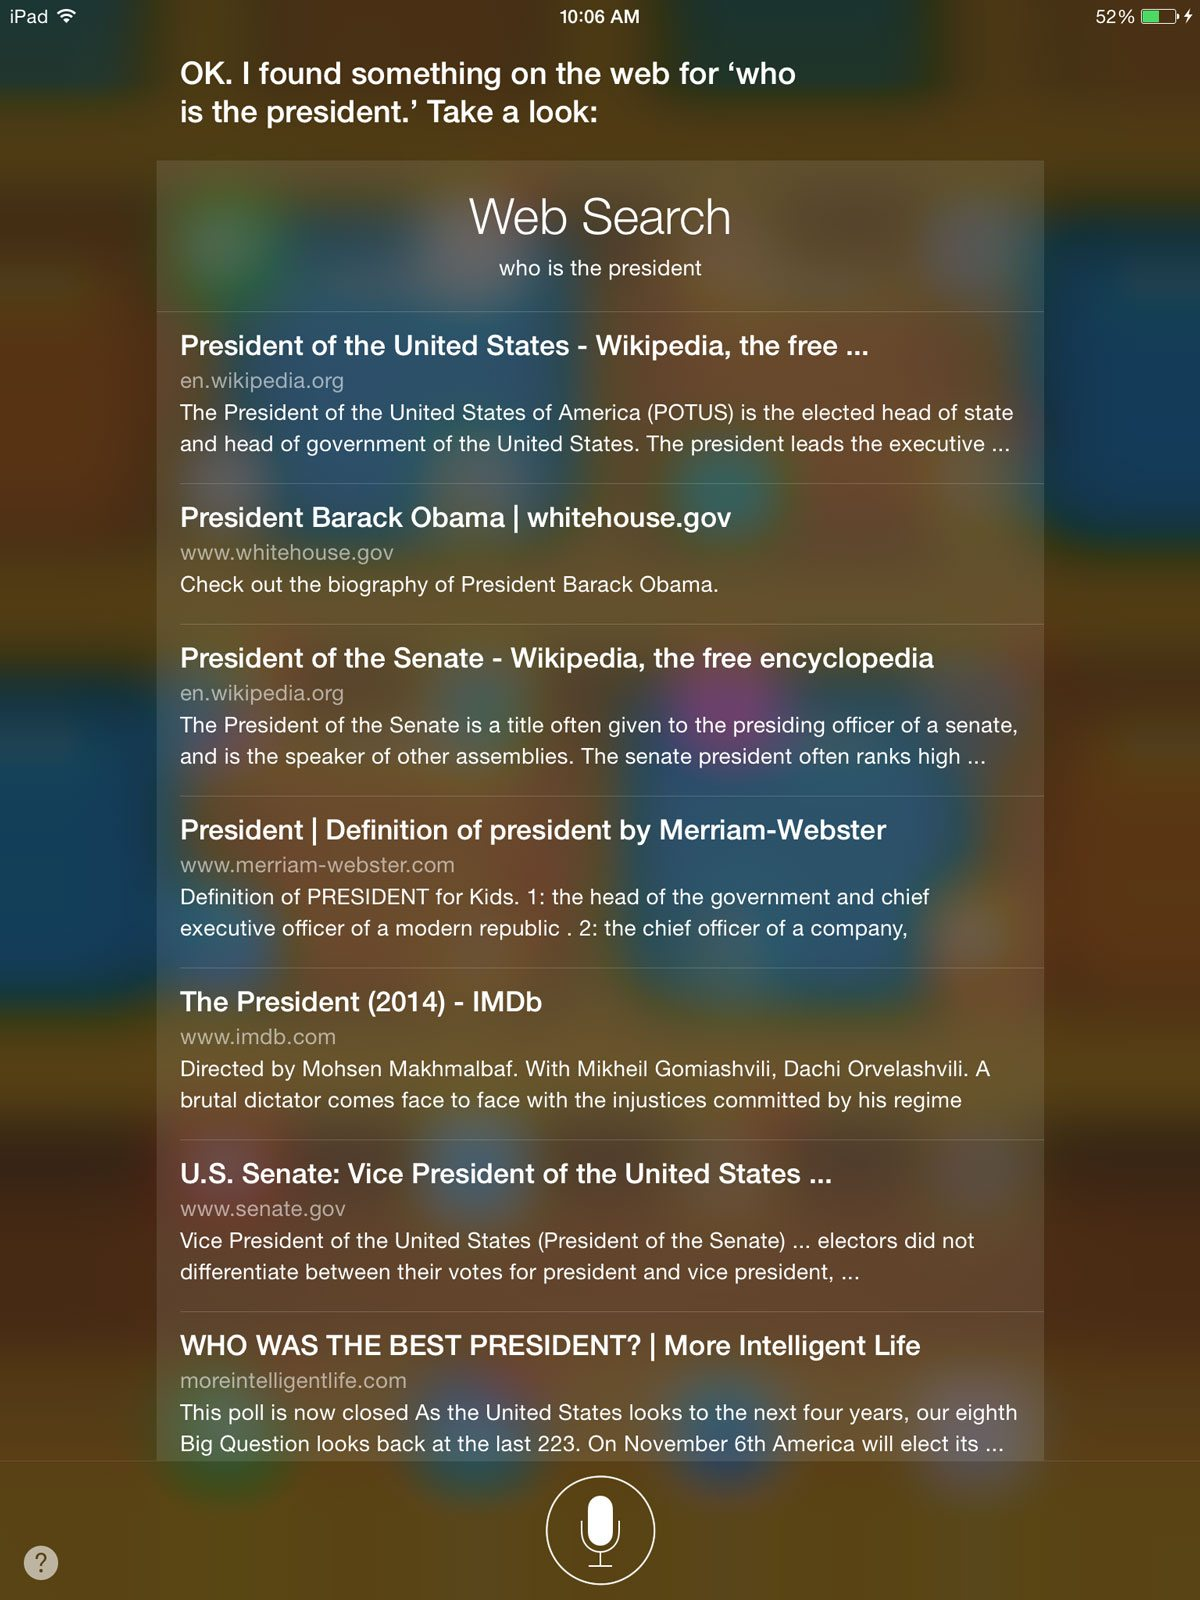 Siri's answer